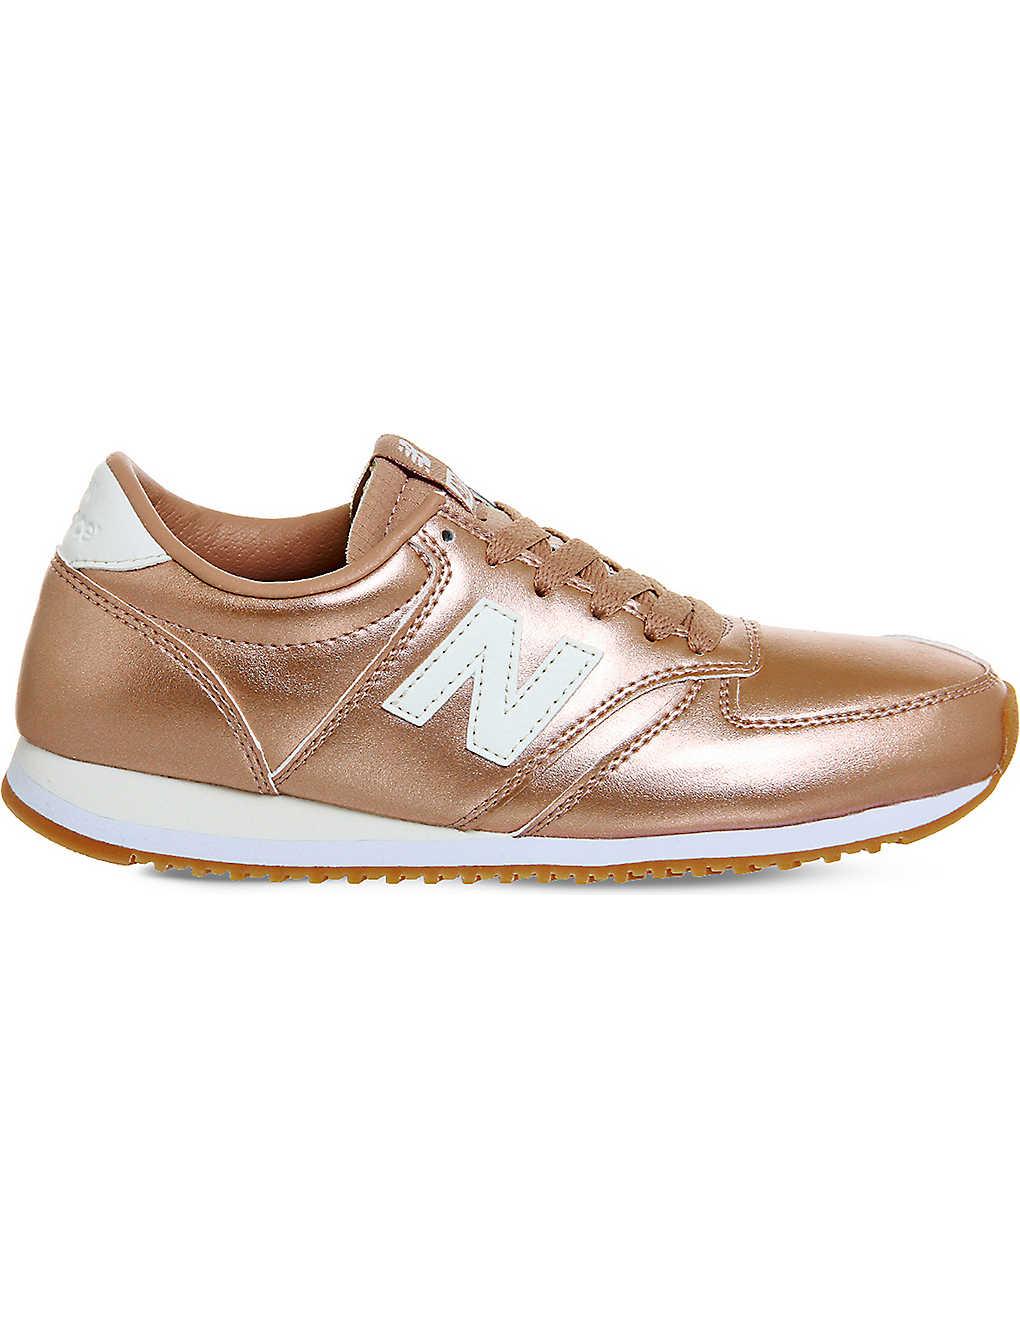 626ed577e1a5f NEW BALANCE - 420 metallic-leather trainers | Selfridges.com